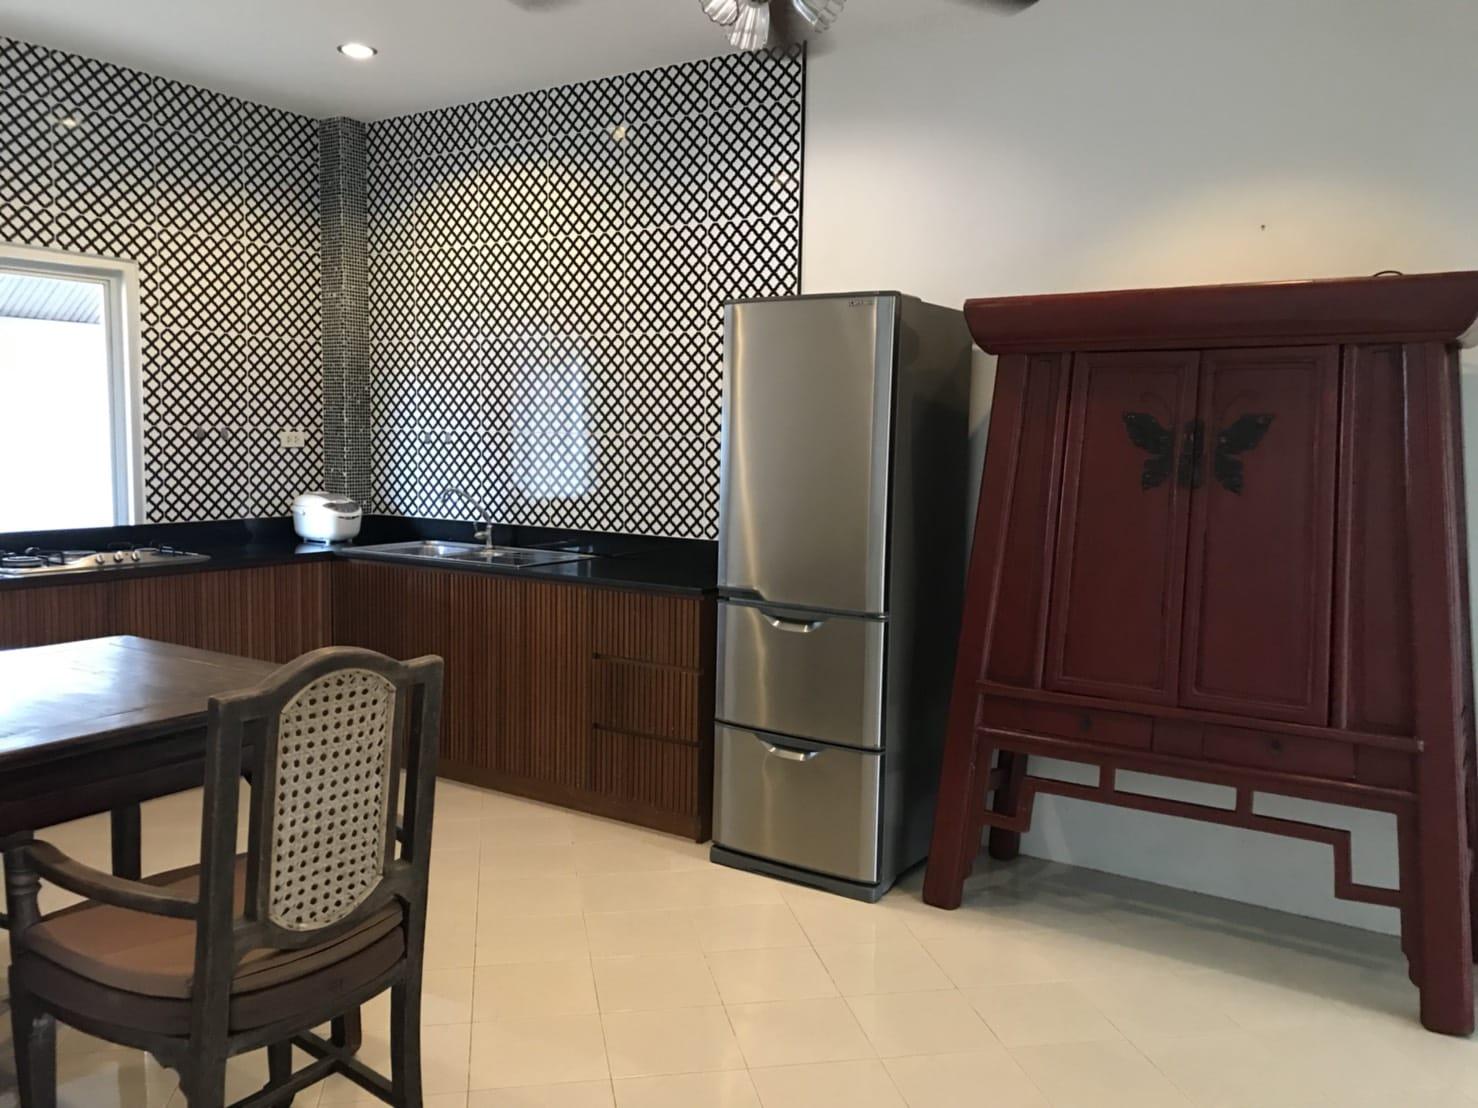 Cherng Talay 2 Bedroom -038694f1-12d7-497b-9d82-330bc69b1785.jpg